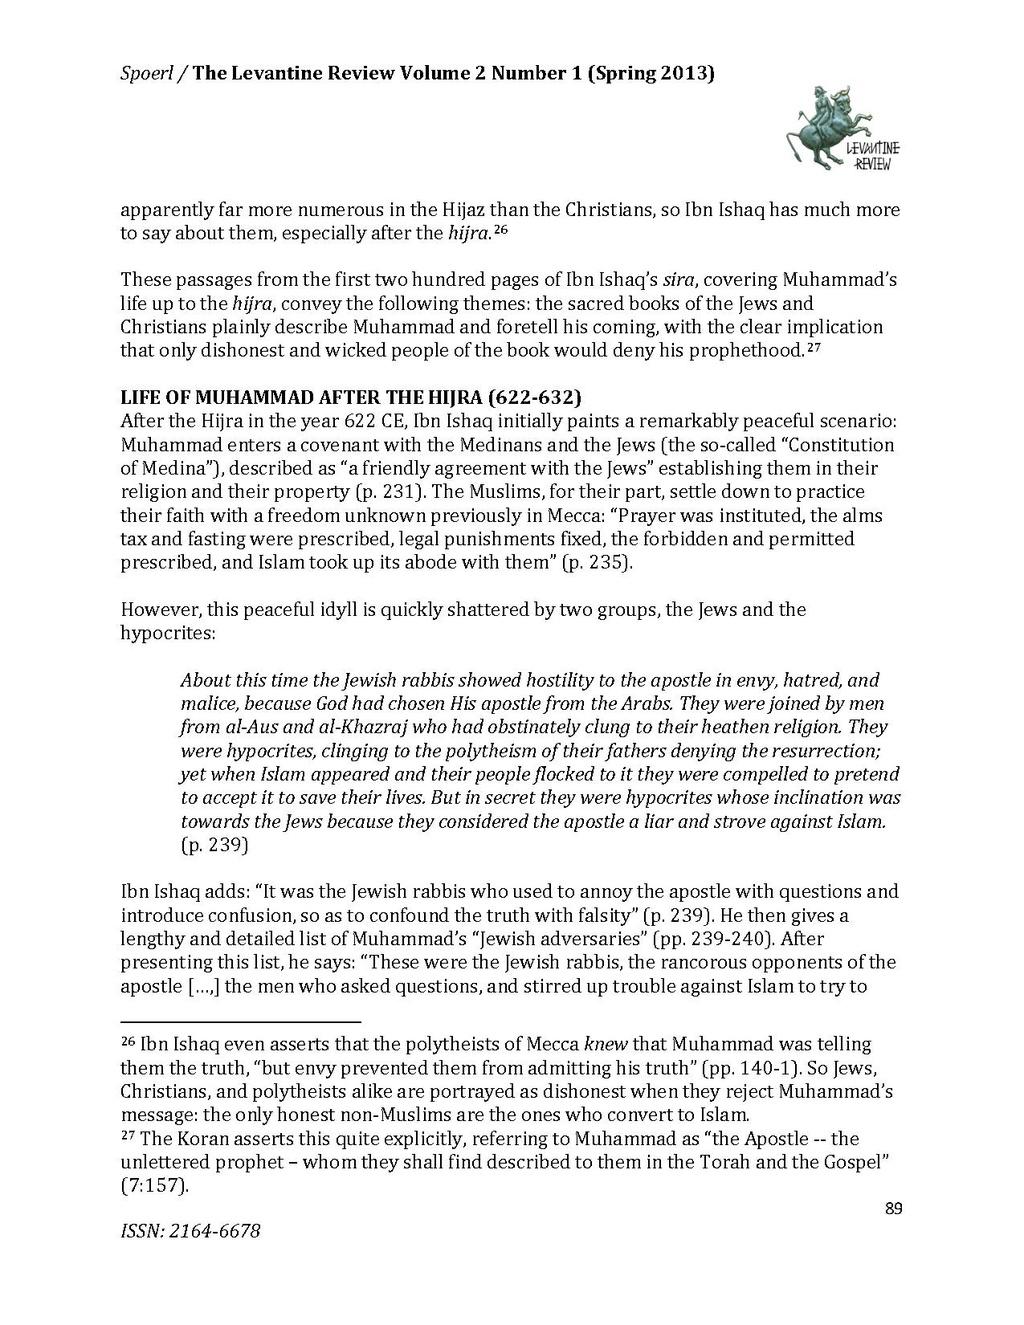 Page:Muhammad and the Jews According to Ibn Ishaq pdf/6 - Wikisource